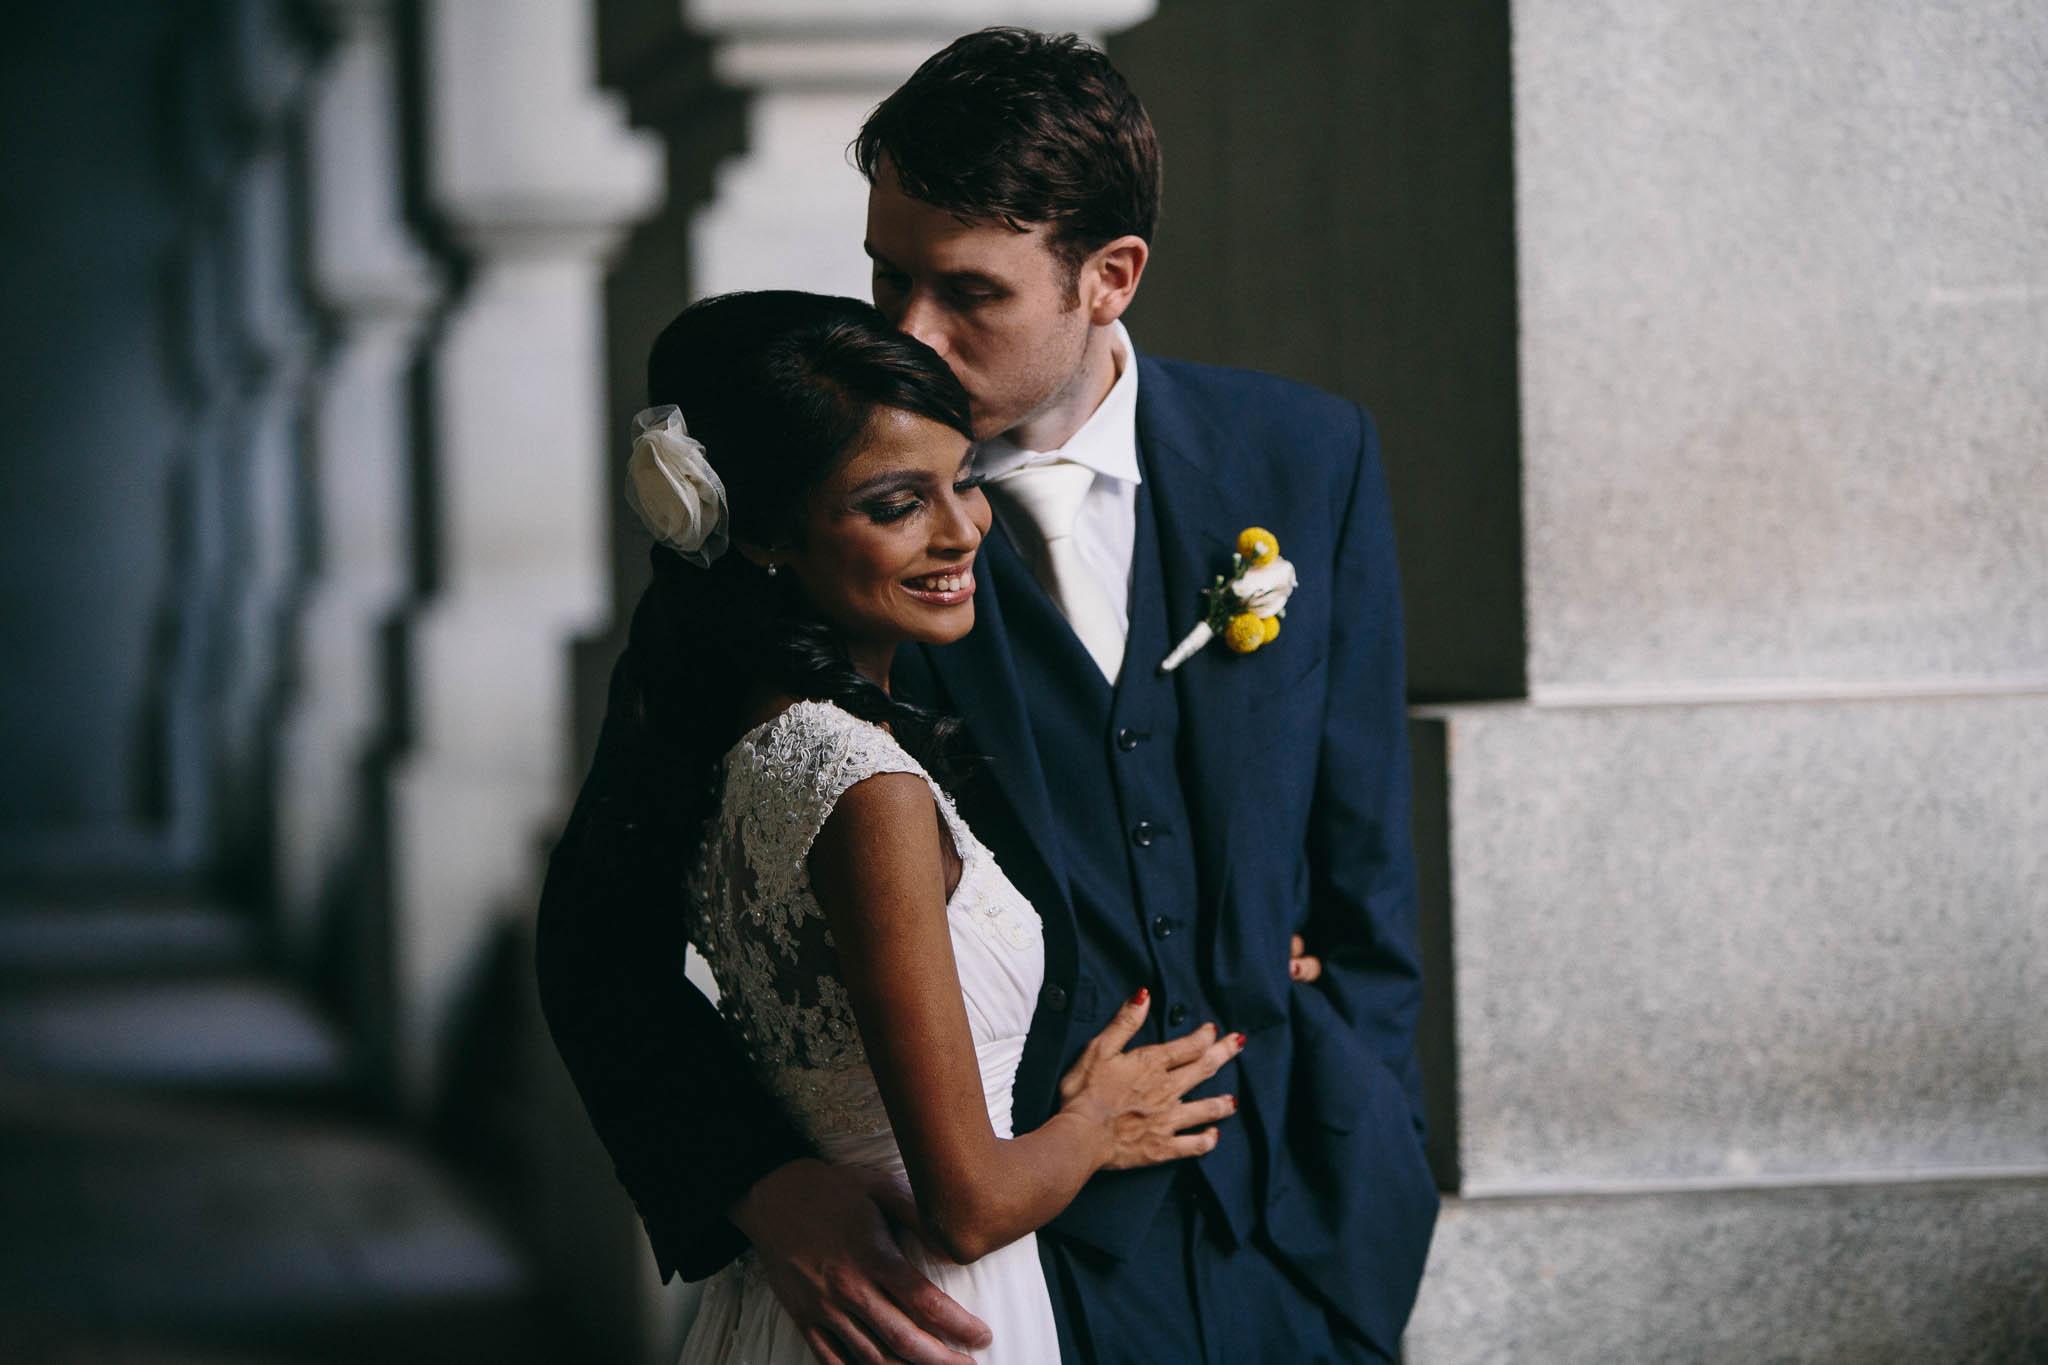 singapore-wedding-photographer-st-andrews-cathedral-renita-david-53.jpg